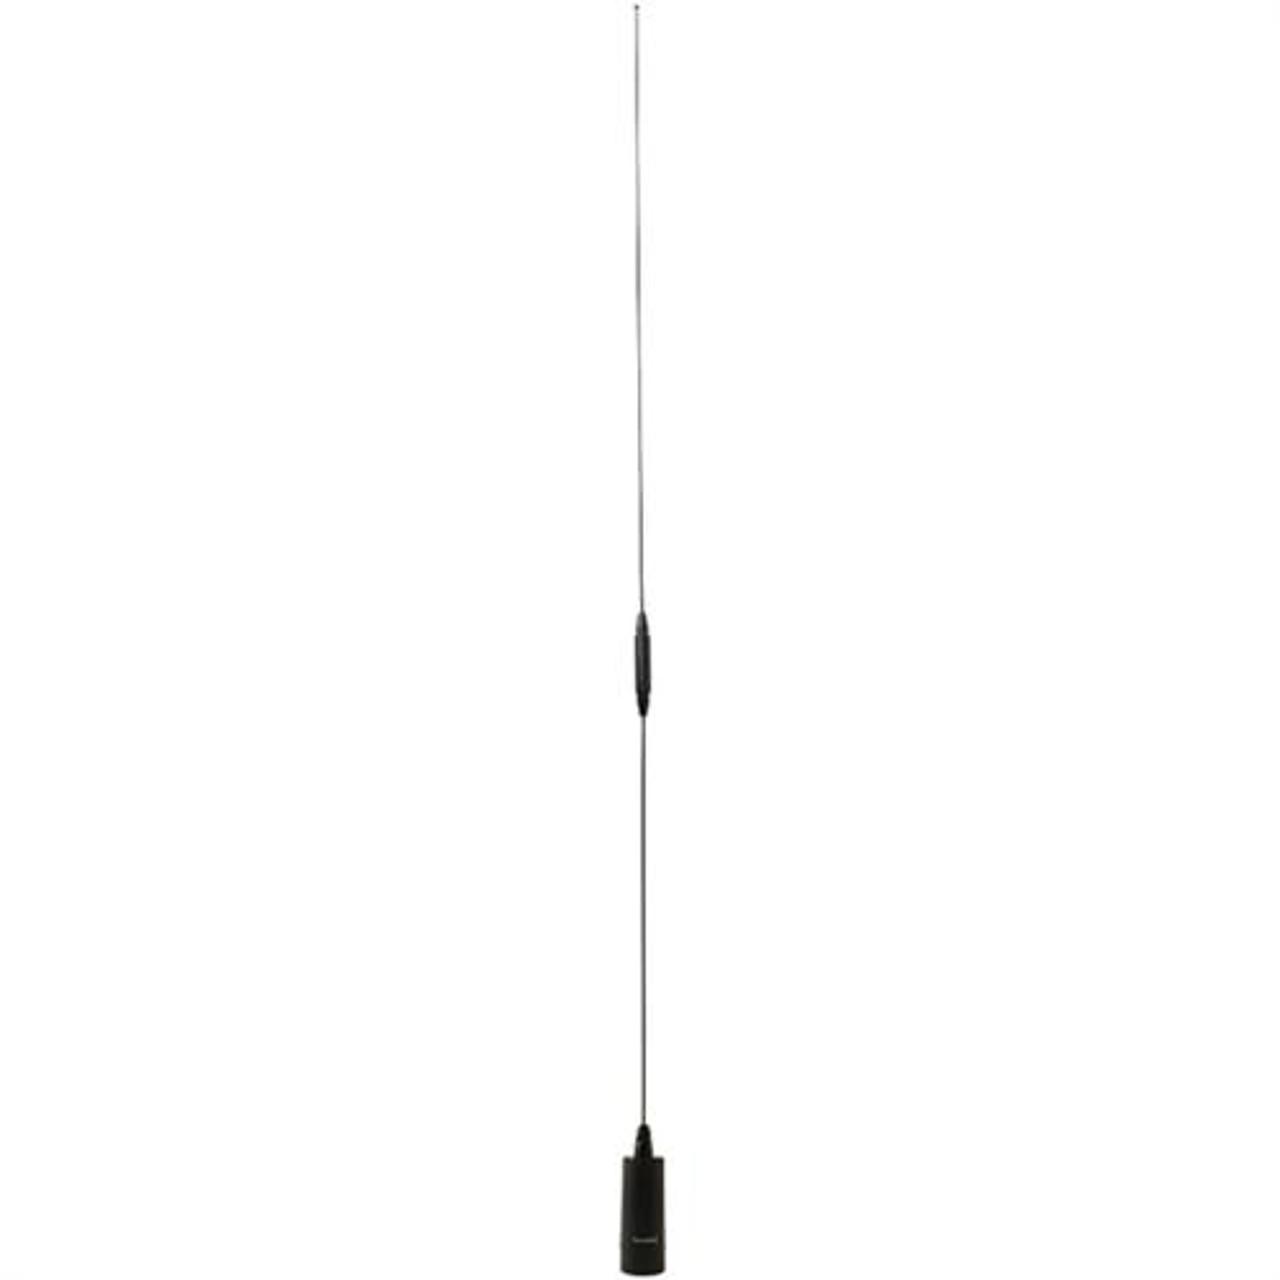 Tram BR-450B 450 - 470 MHz  NMO Antenna Black